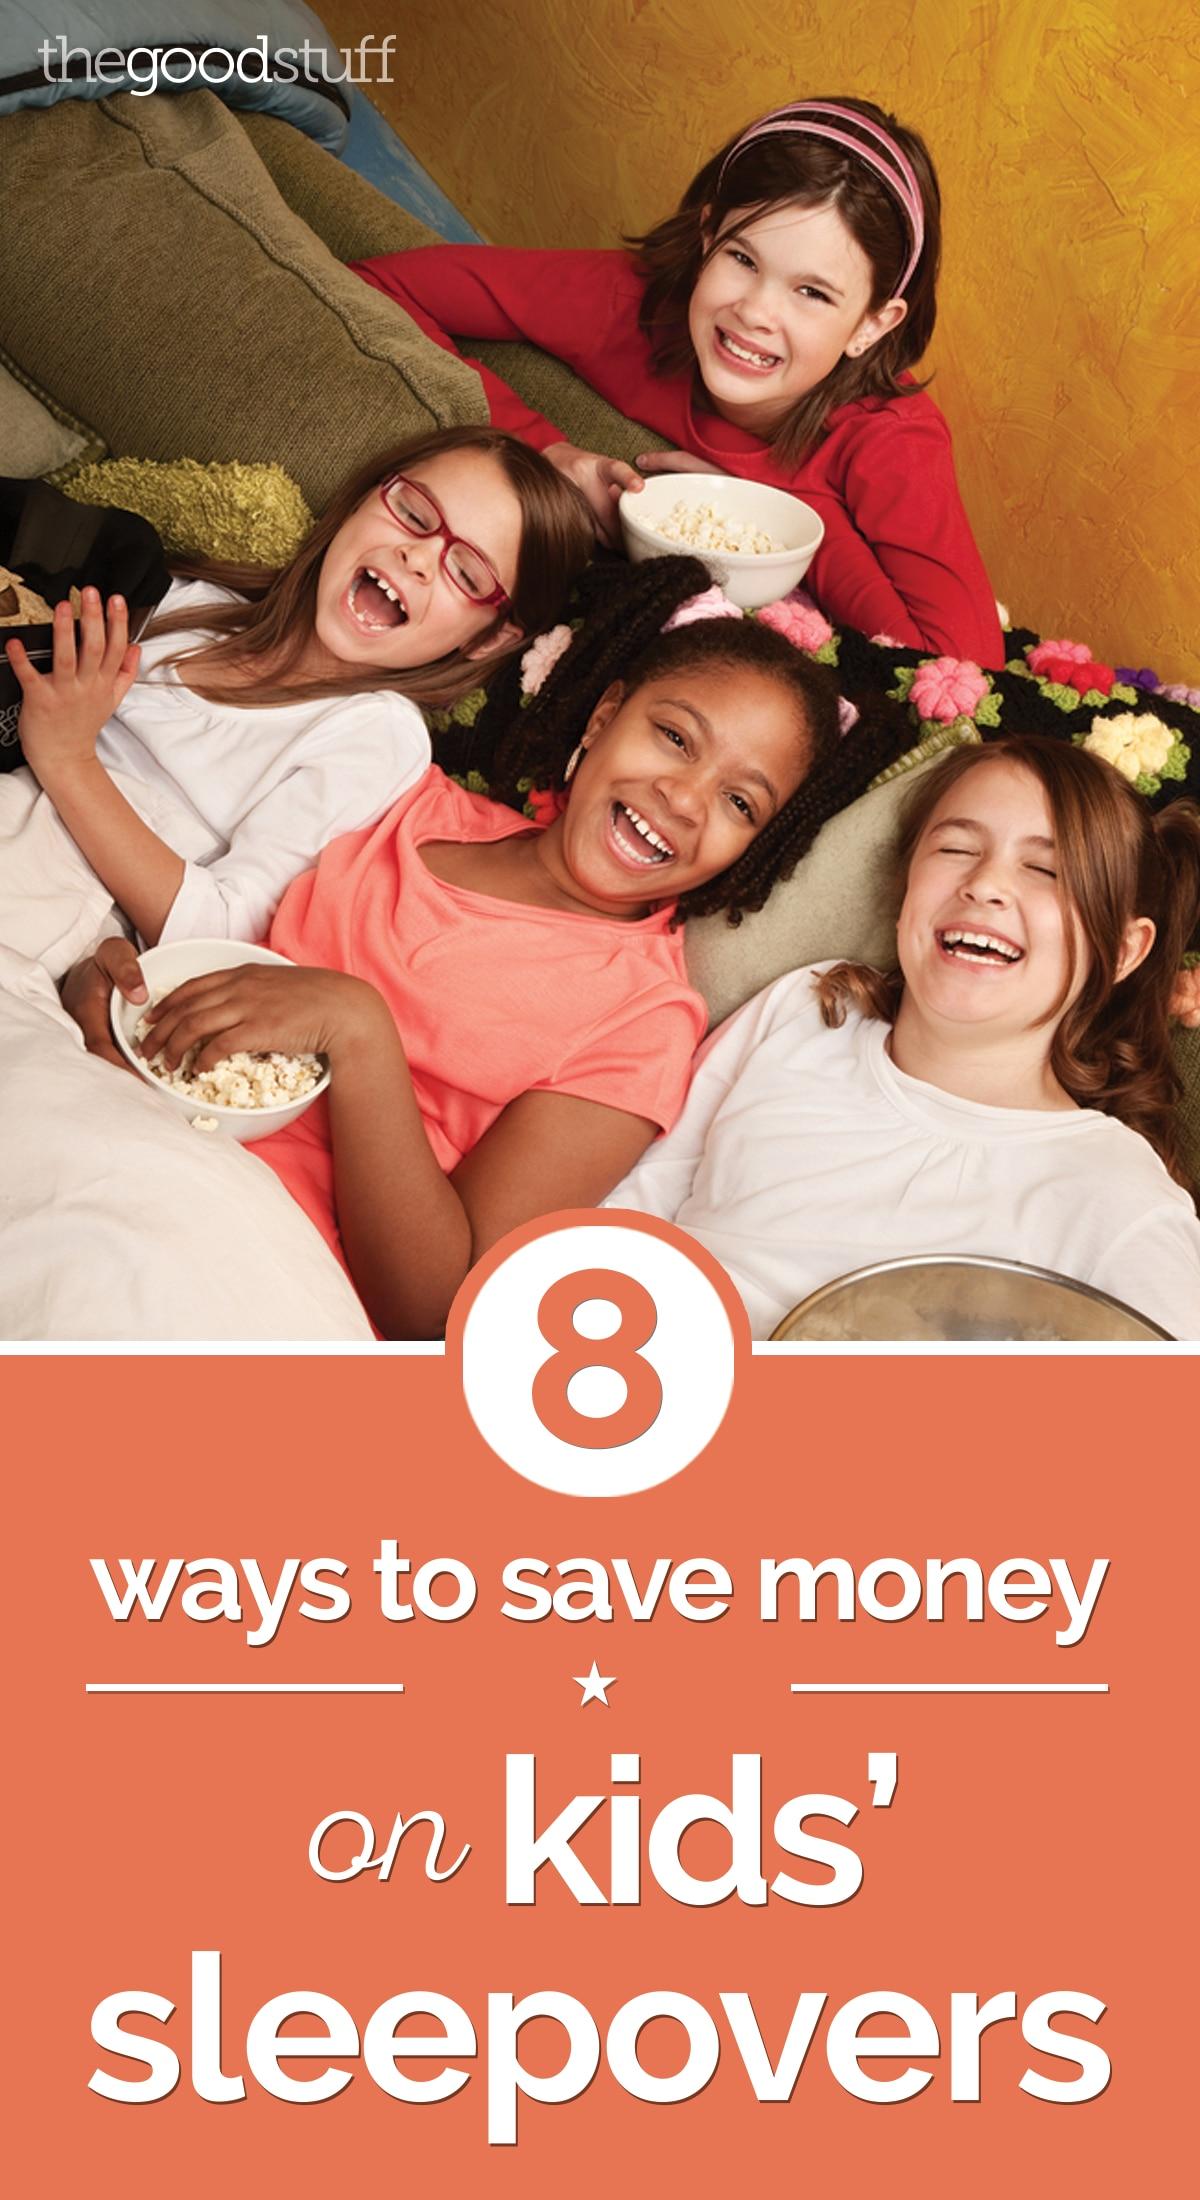 8 Ways to Save Money on Kids' Sleepovers | thegoodstuff